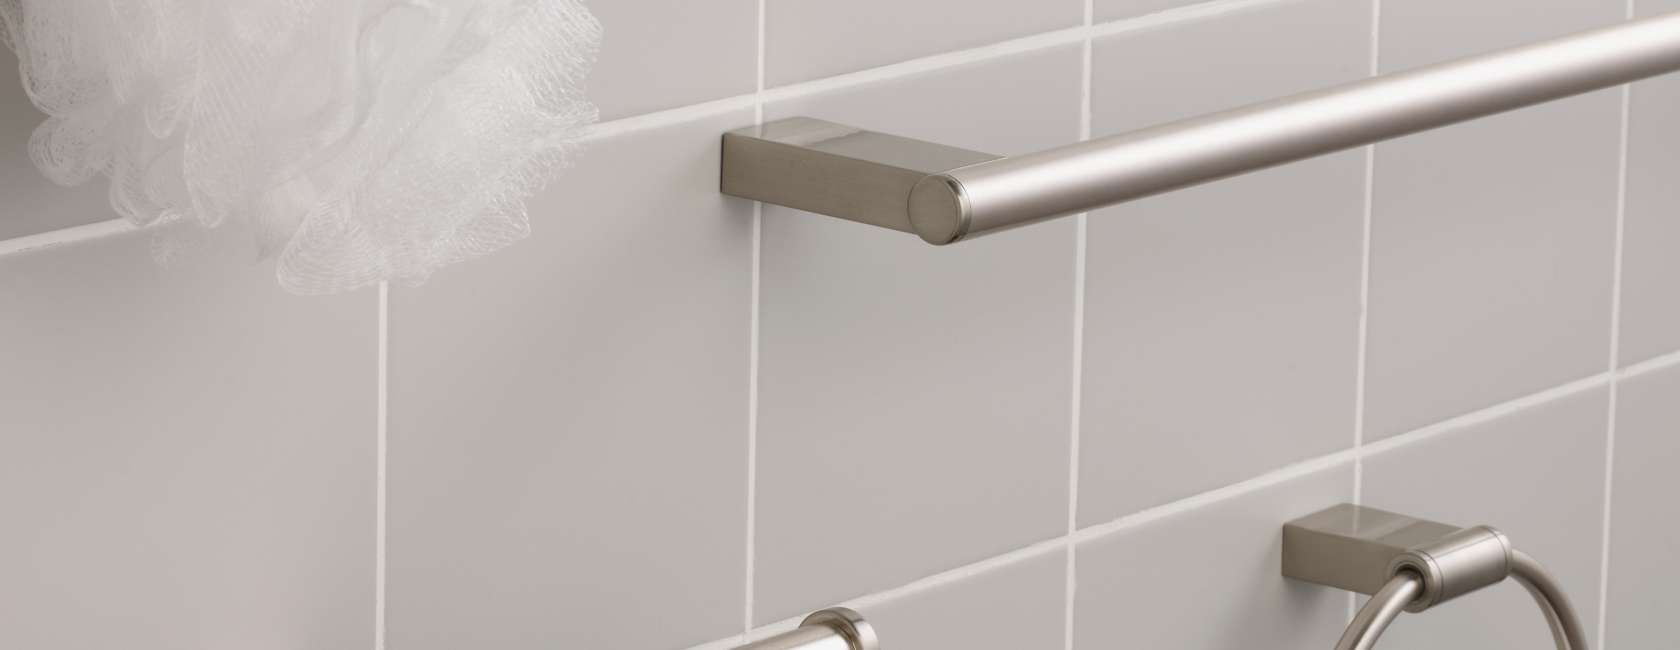 John Lewis Amp Partners Satin Bathroom Fitting Range At John